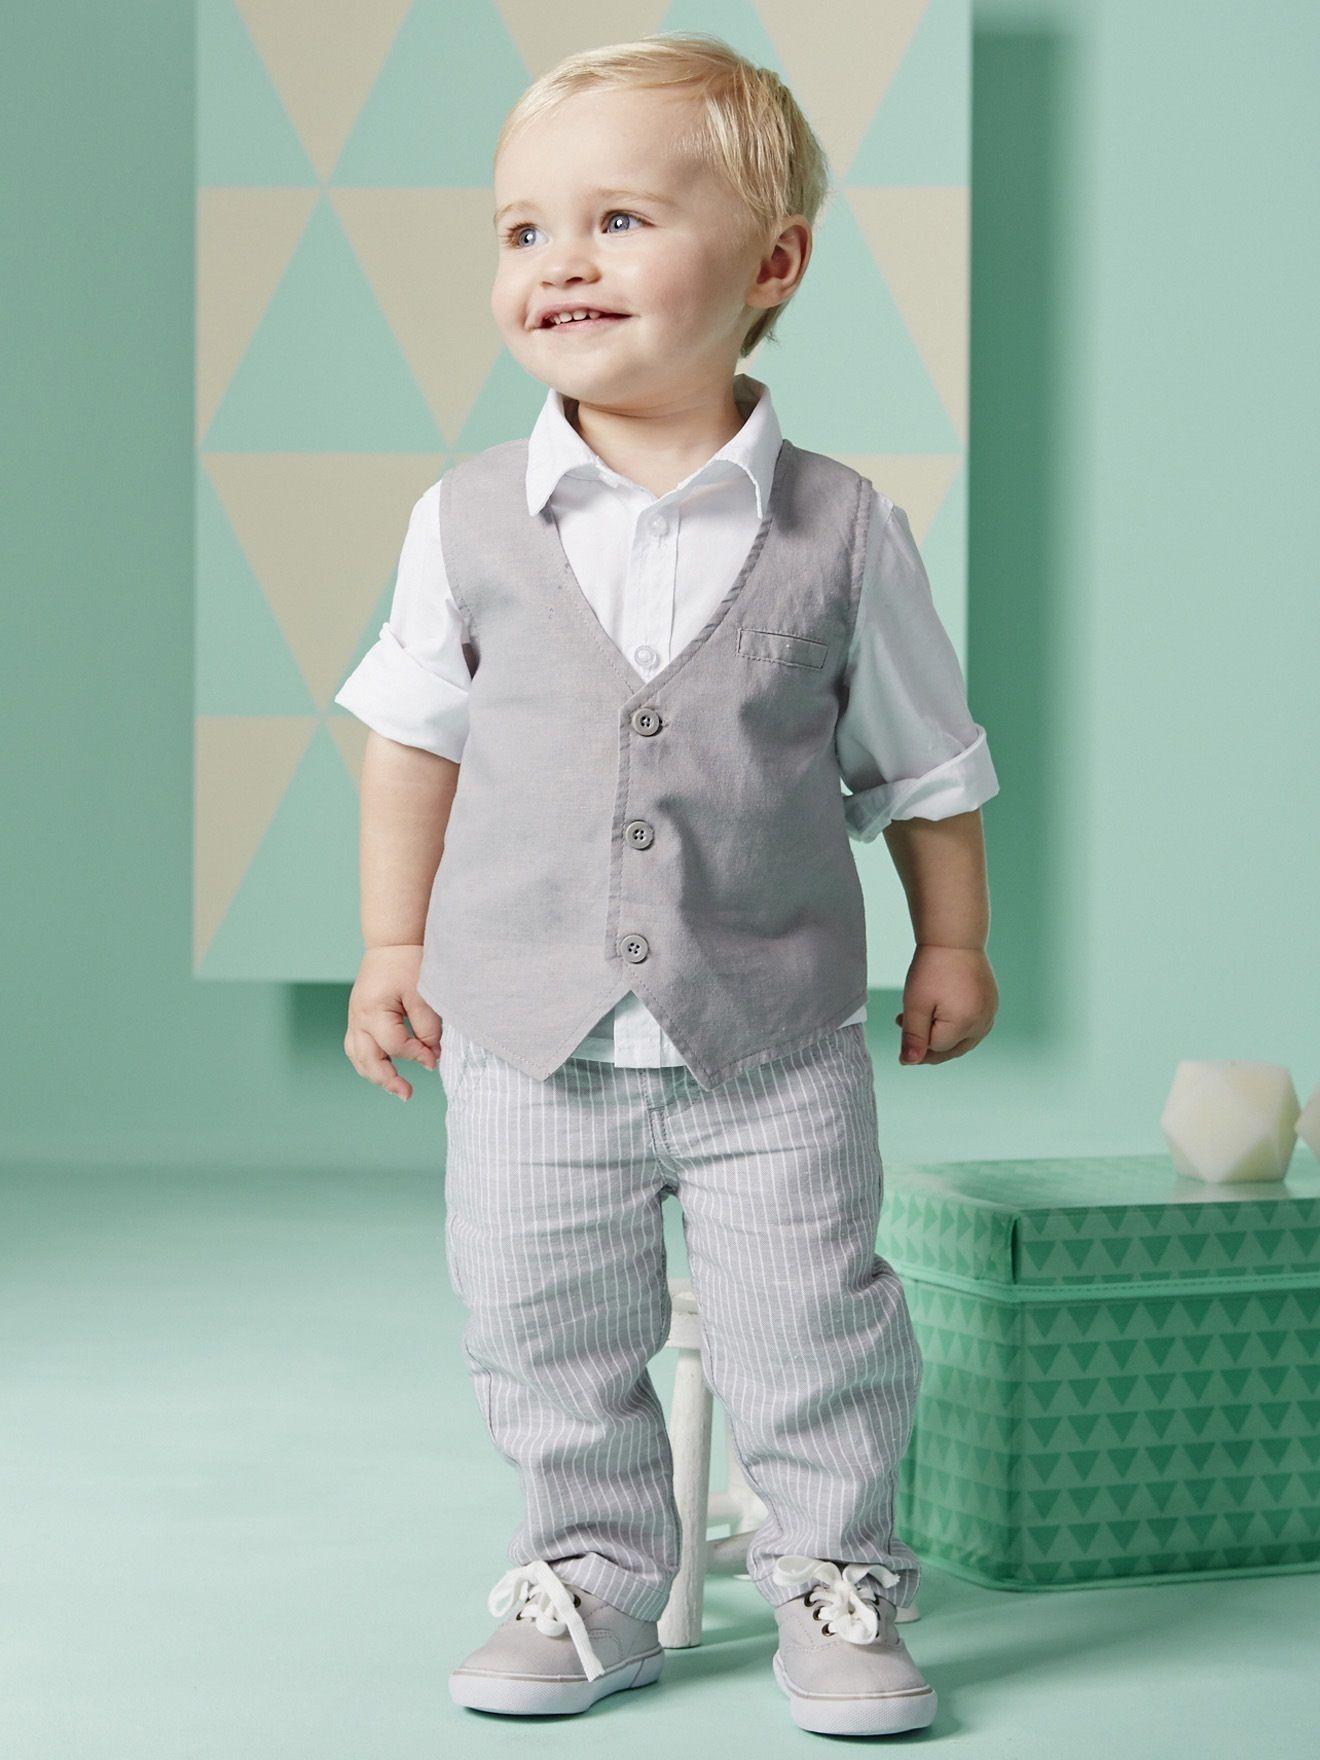 8fb78cc28 2016 New Boy Sets Long Sleeve Shirts Vest Pants 3Pcs Sets Boy Gentleman  Sets baby boy waistcoat set striped three piece suit